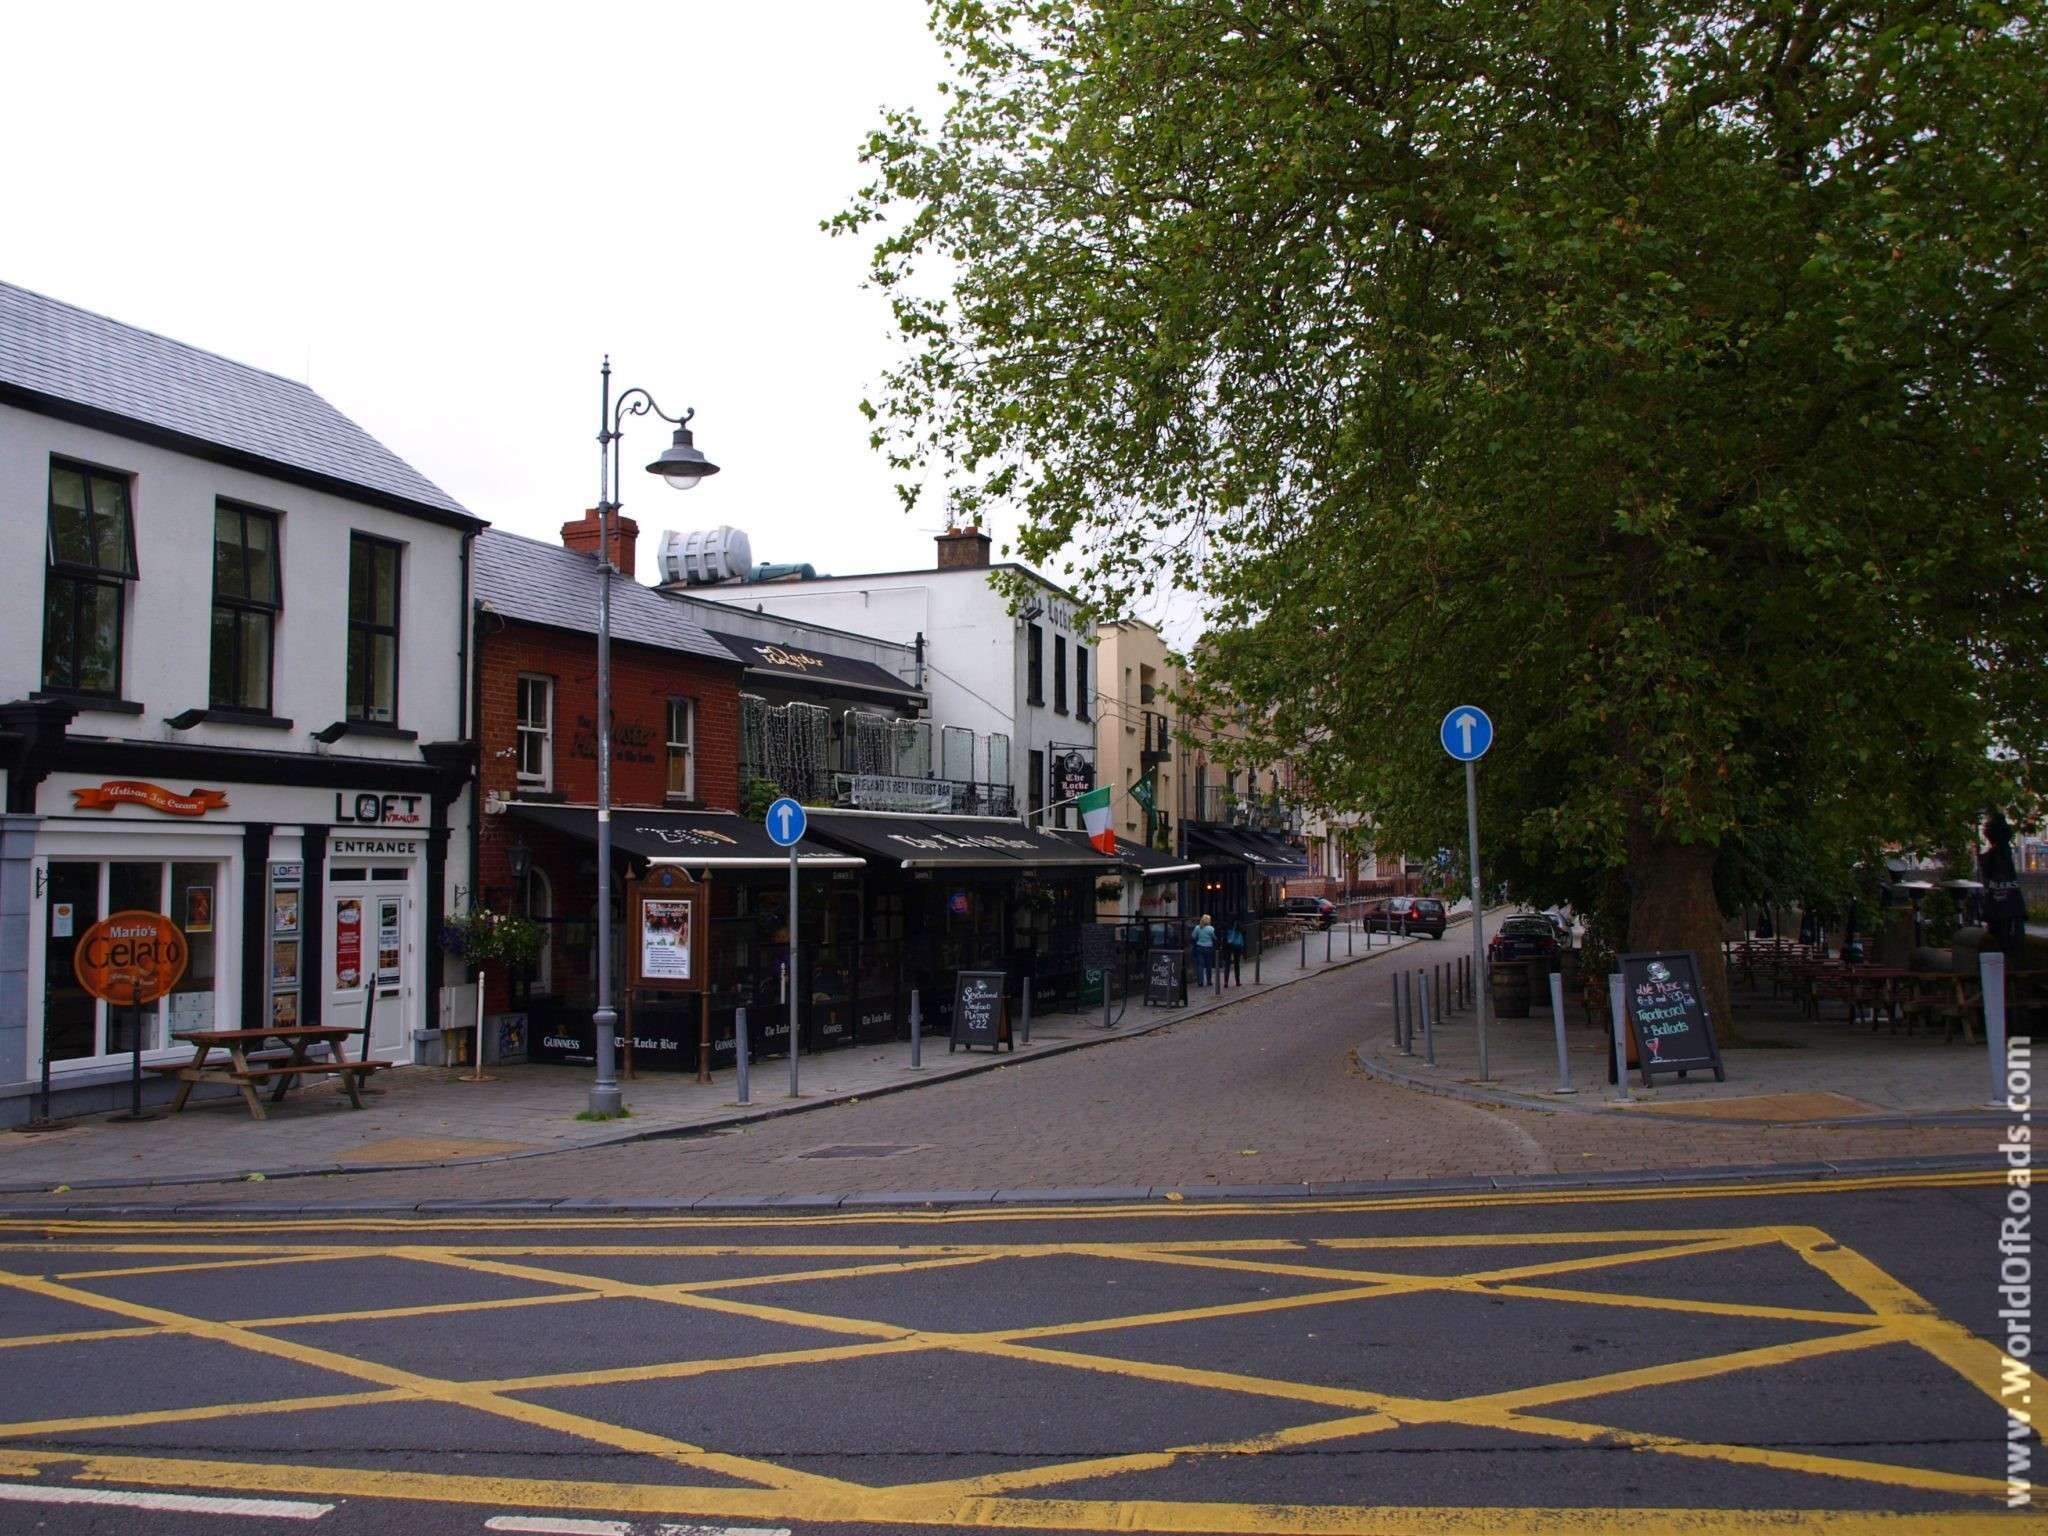 Улицы города Лимерик. Ирландия.